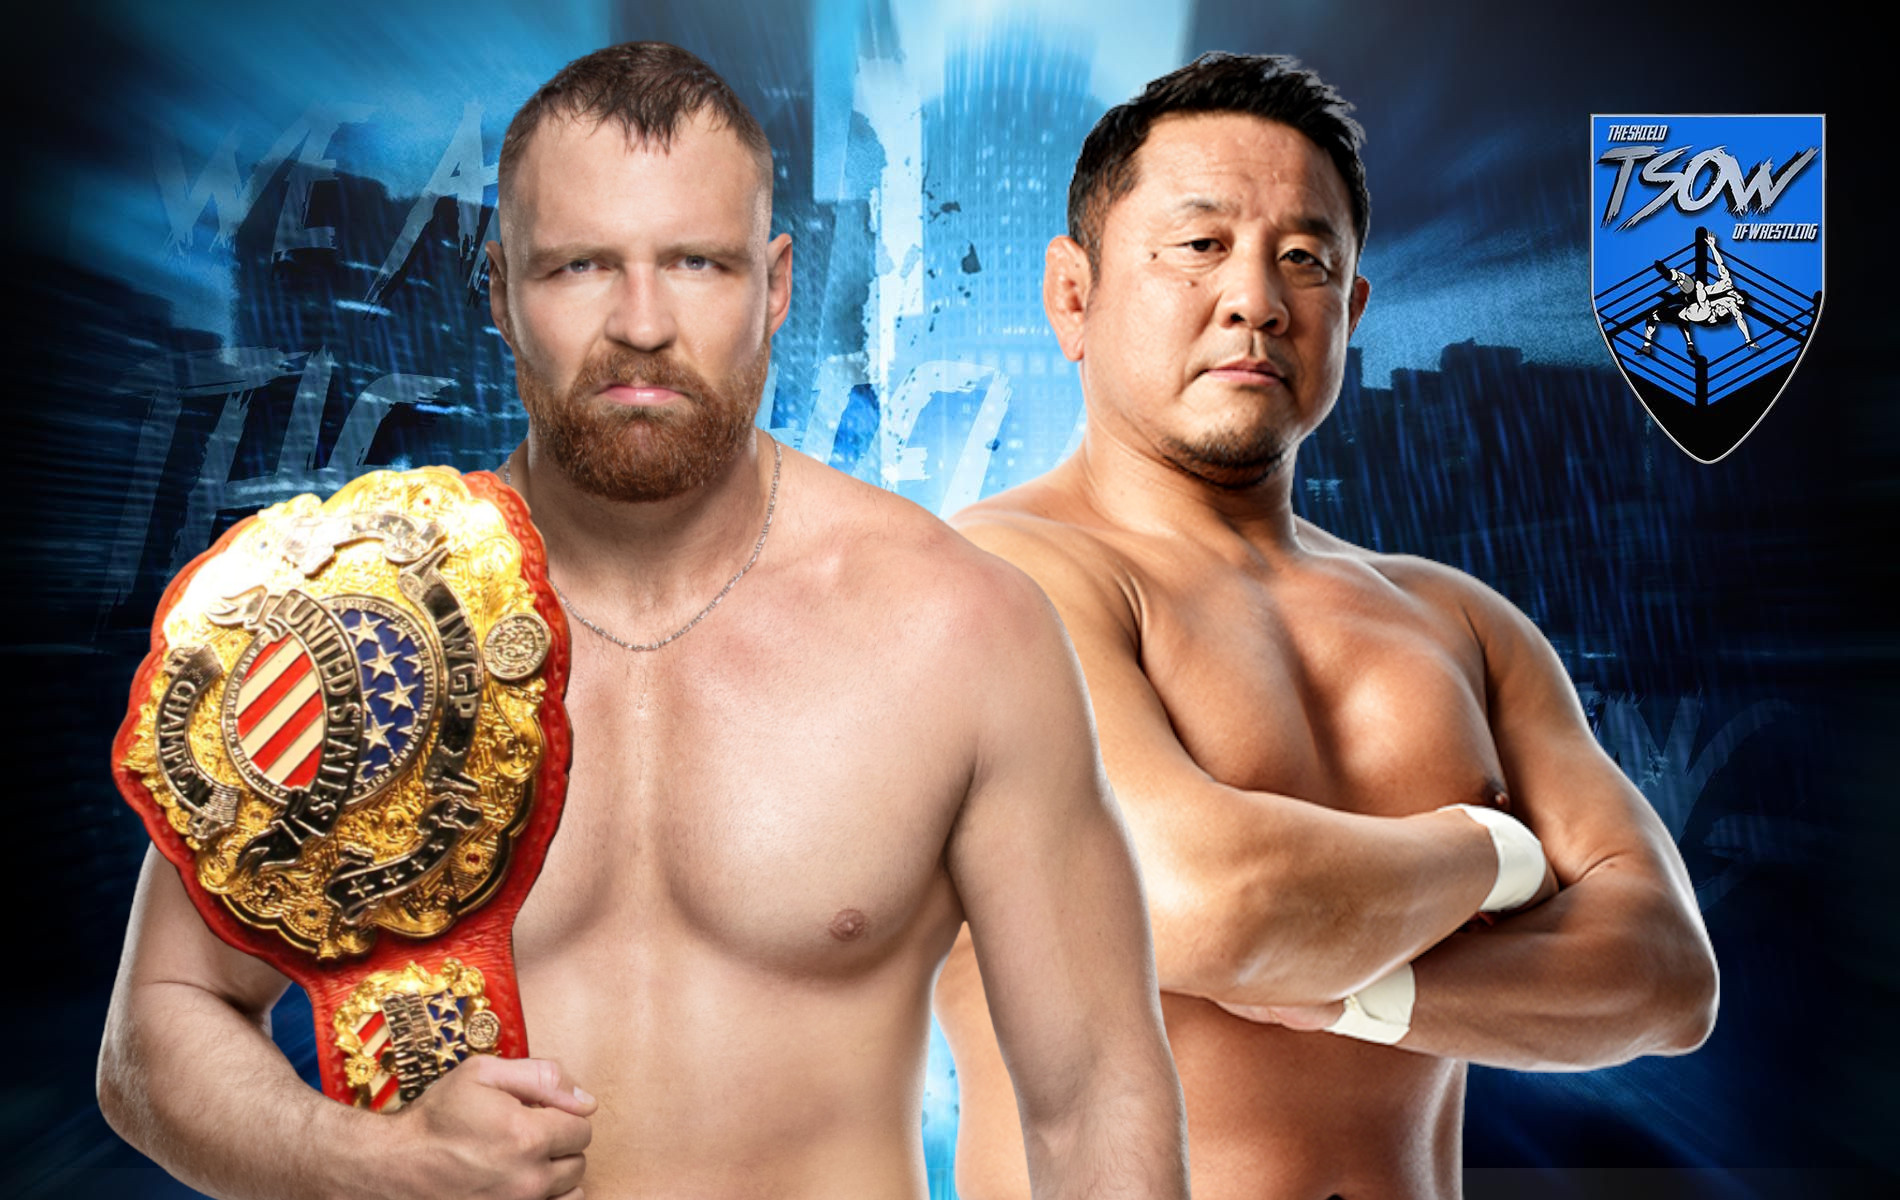 Jon Moxley vs Yuji Nagata: chi ha vinto ad AEW Dynamite?